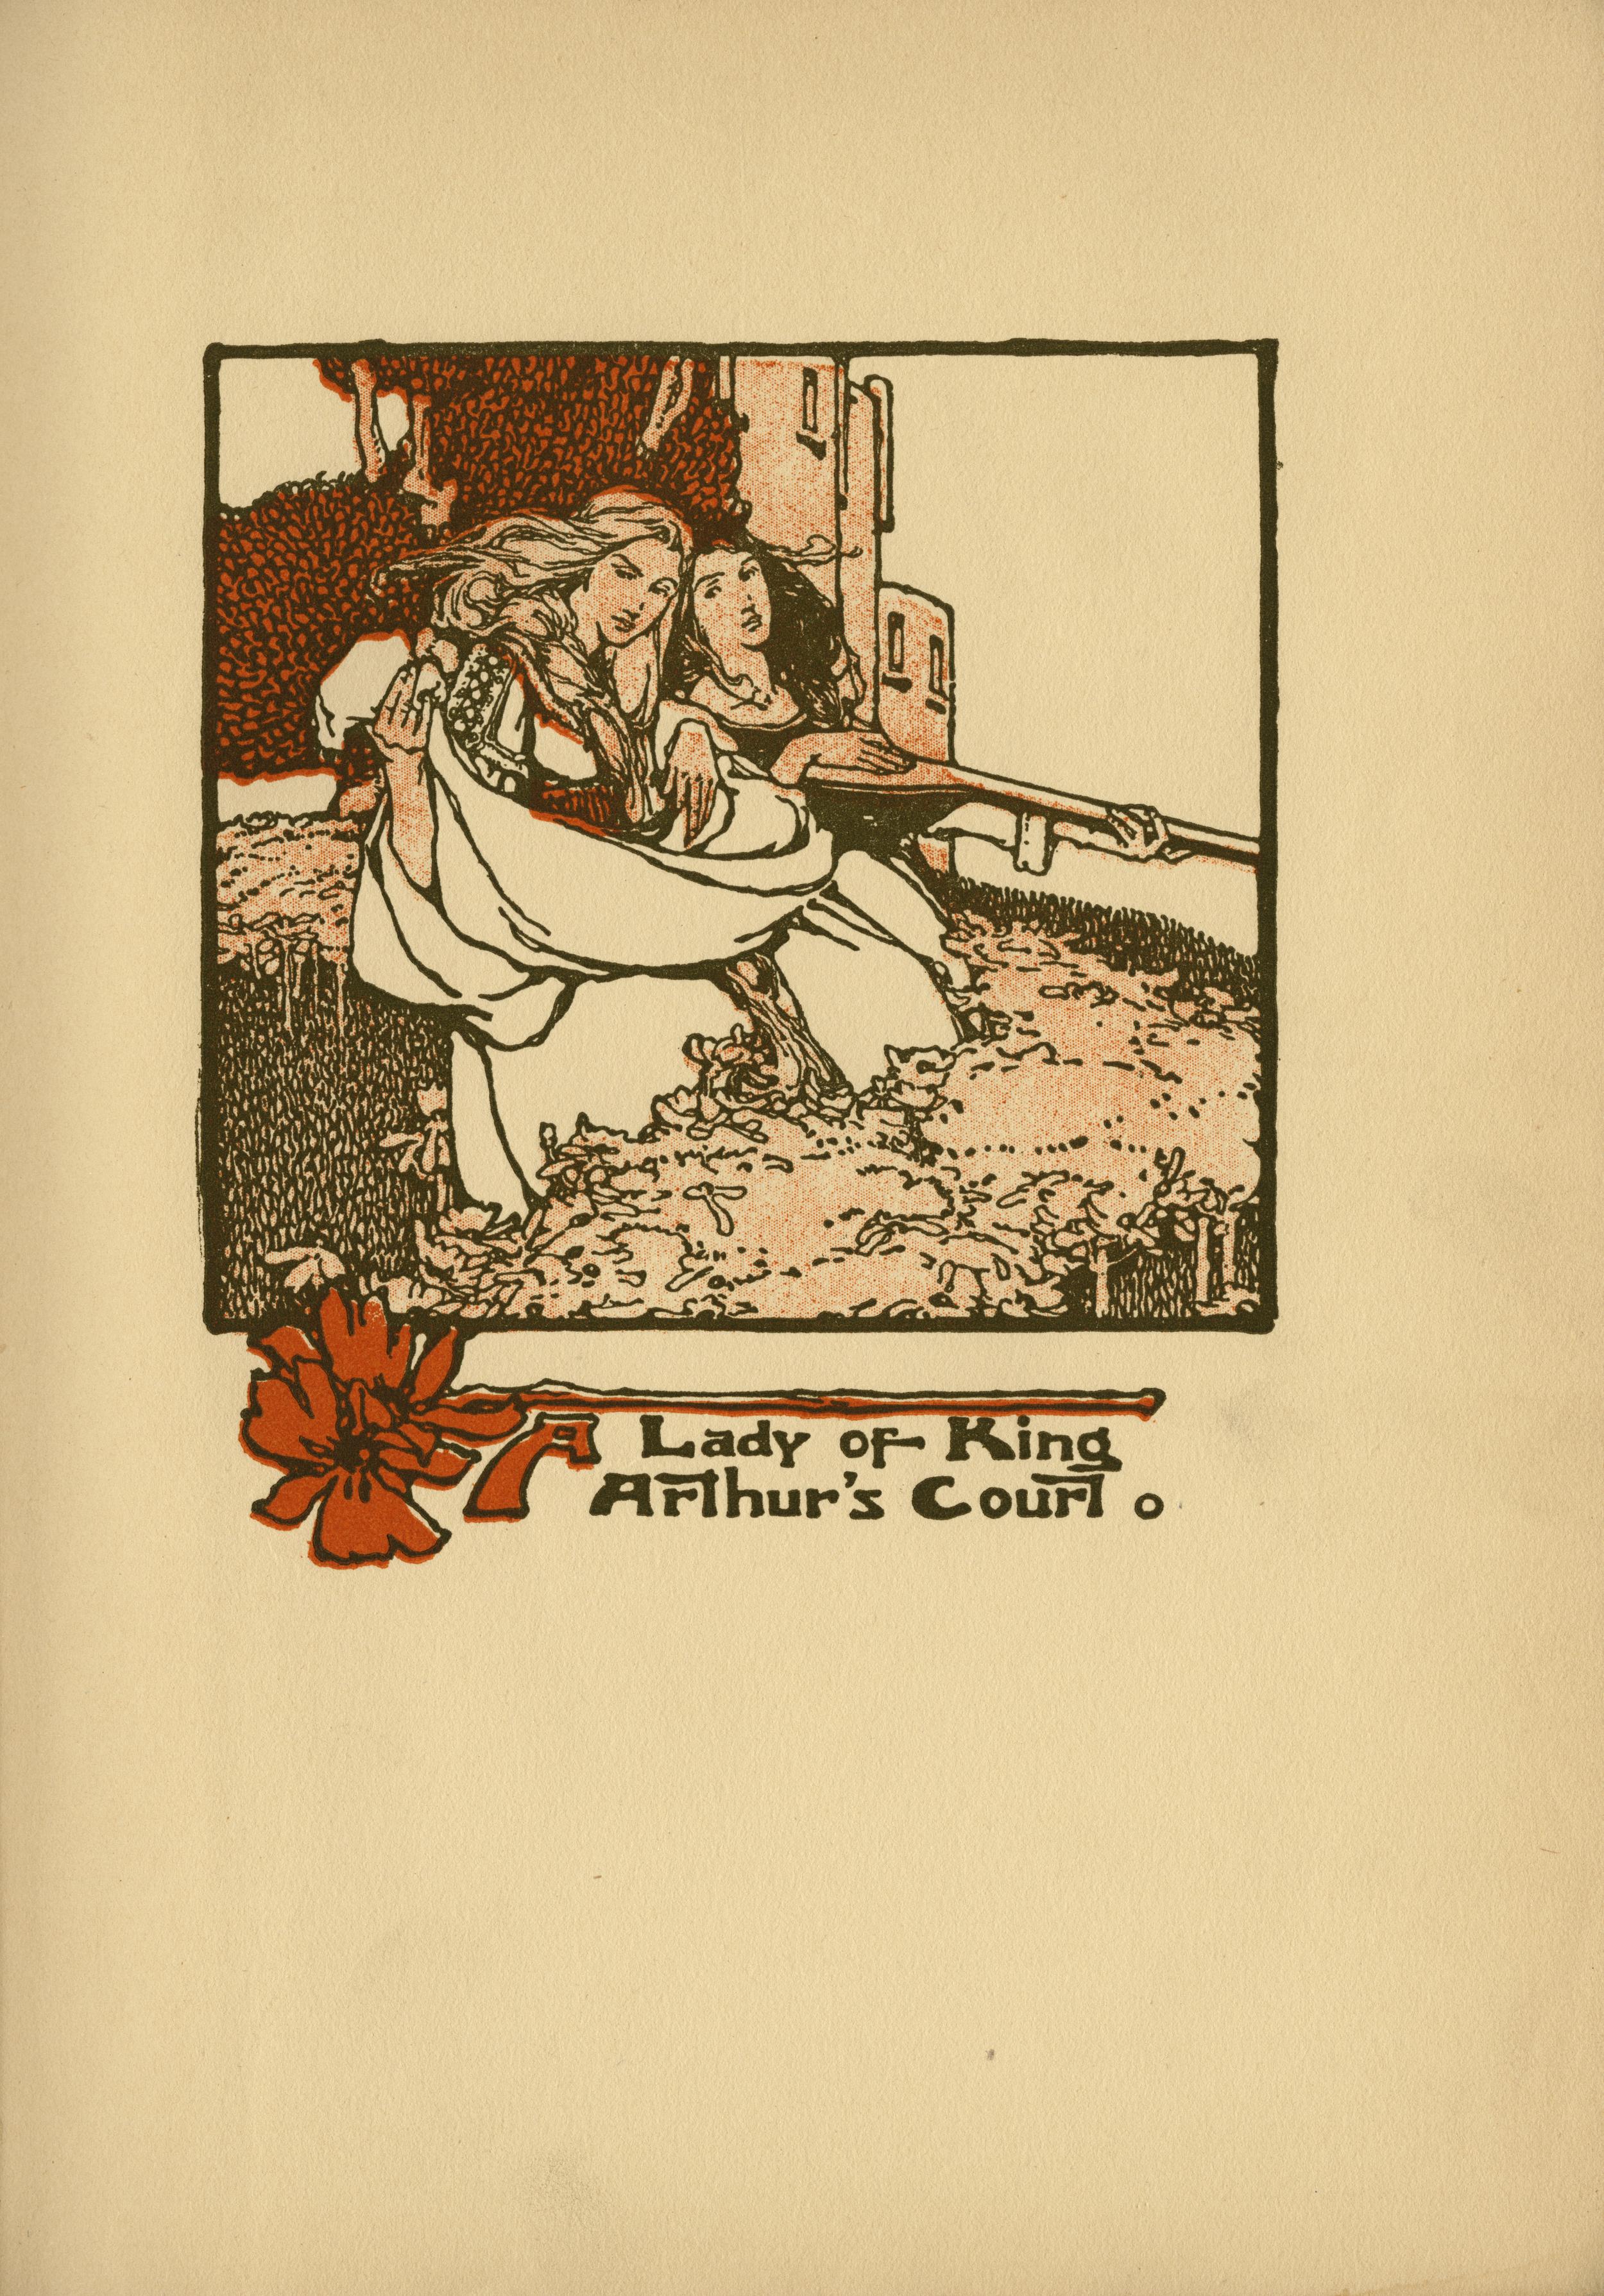 Clara Elsene Peck. A Lady of King Arthur's Court. Written by Sara Hawks Sterling. Frontispiece. 1907.